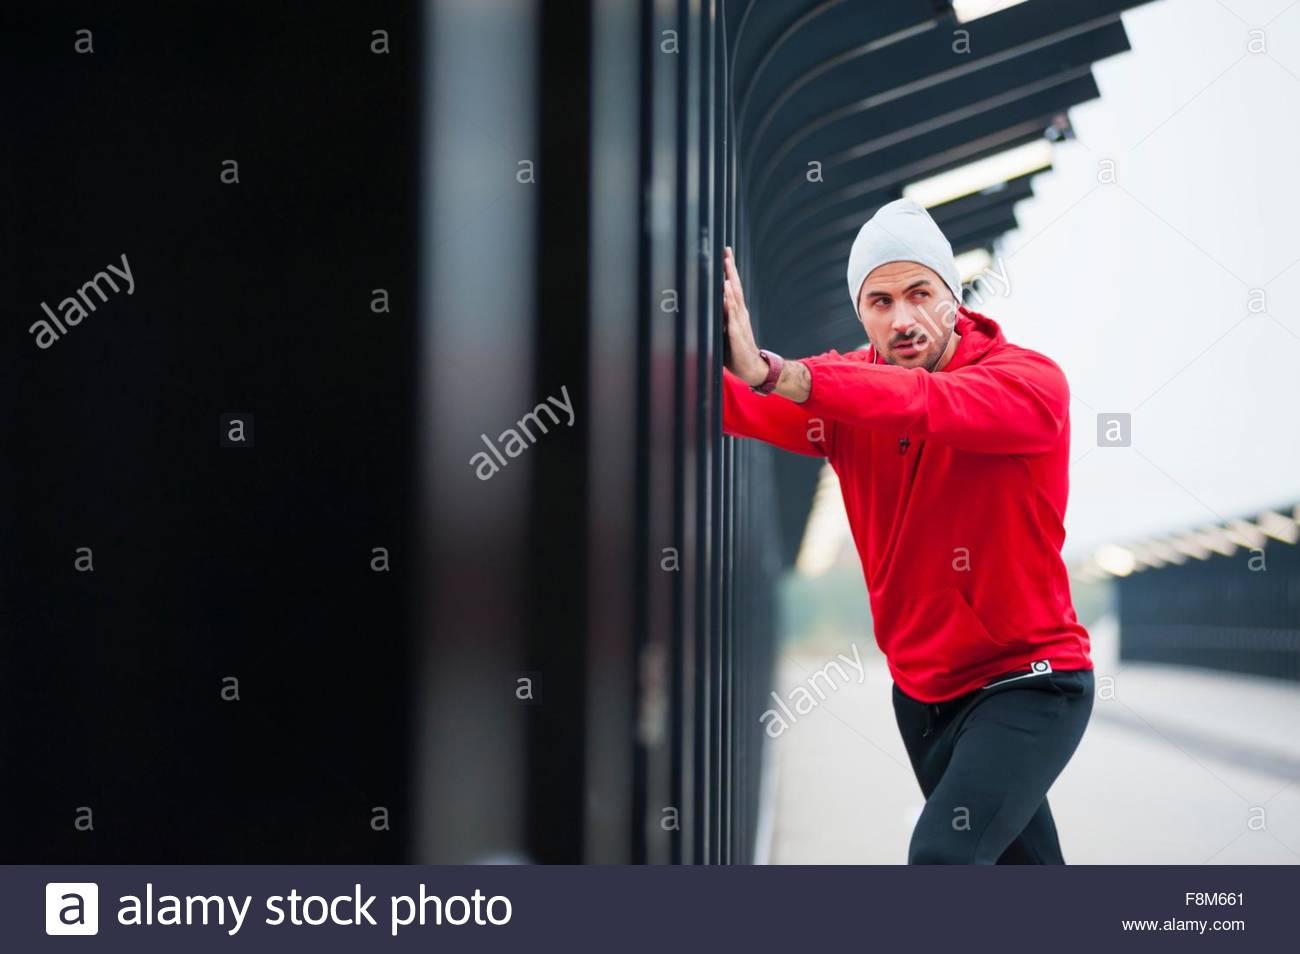 Young man doing physical push training on city footbridge - Stock Image